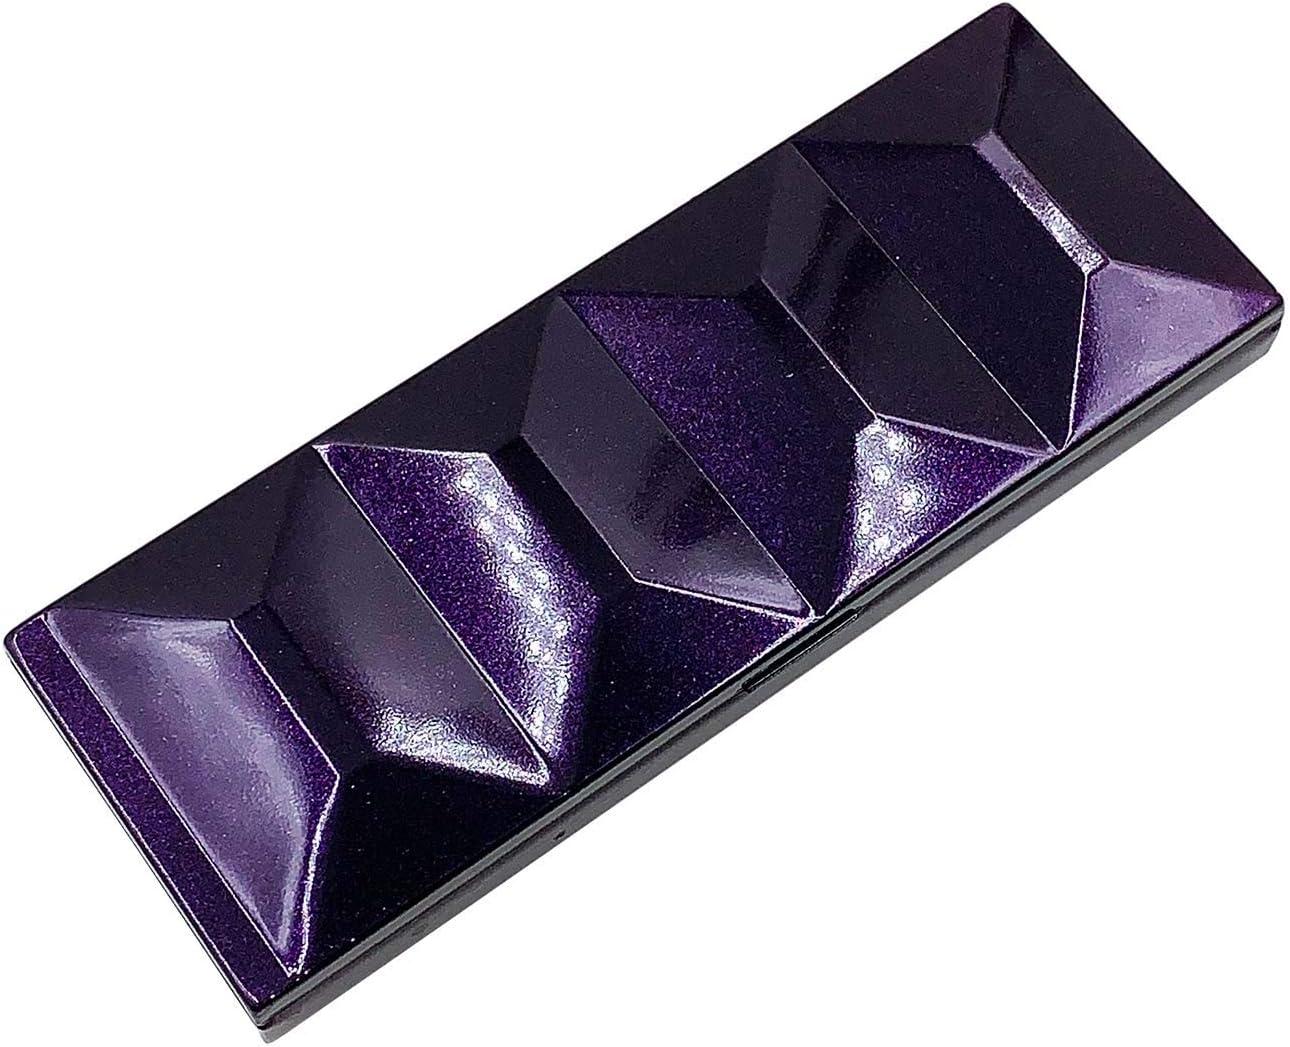 Davi Cash special price Atelier Empty Watercolor Tins Heavy Case New popularity Palette Paint Box